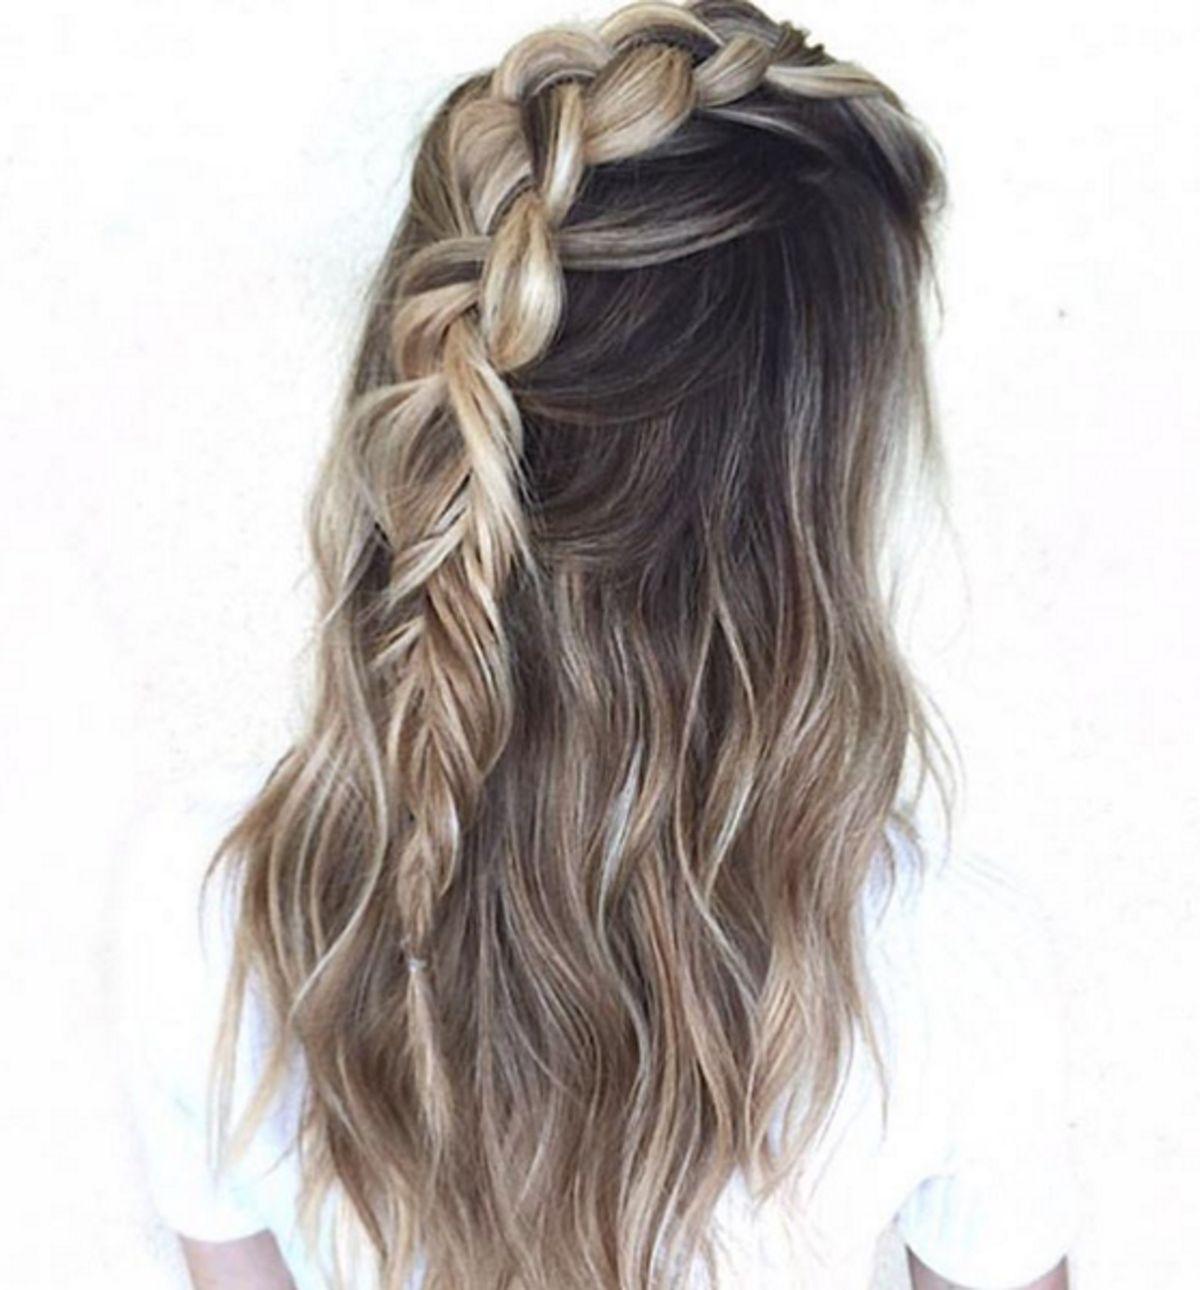 Pin by kayla tittle on hair pinterest hair hair styles and hair